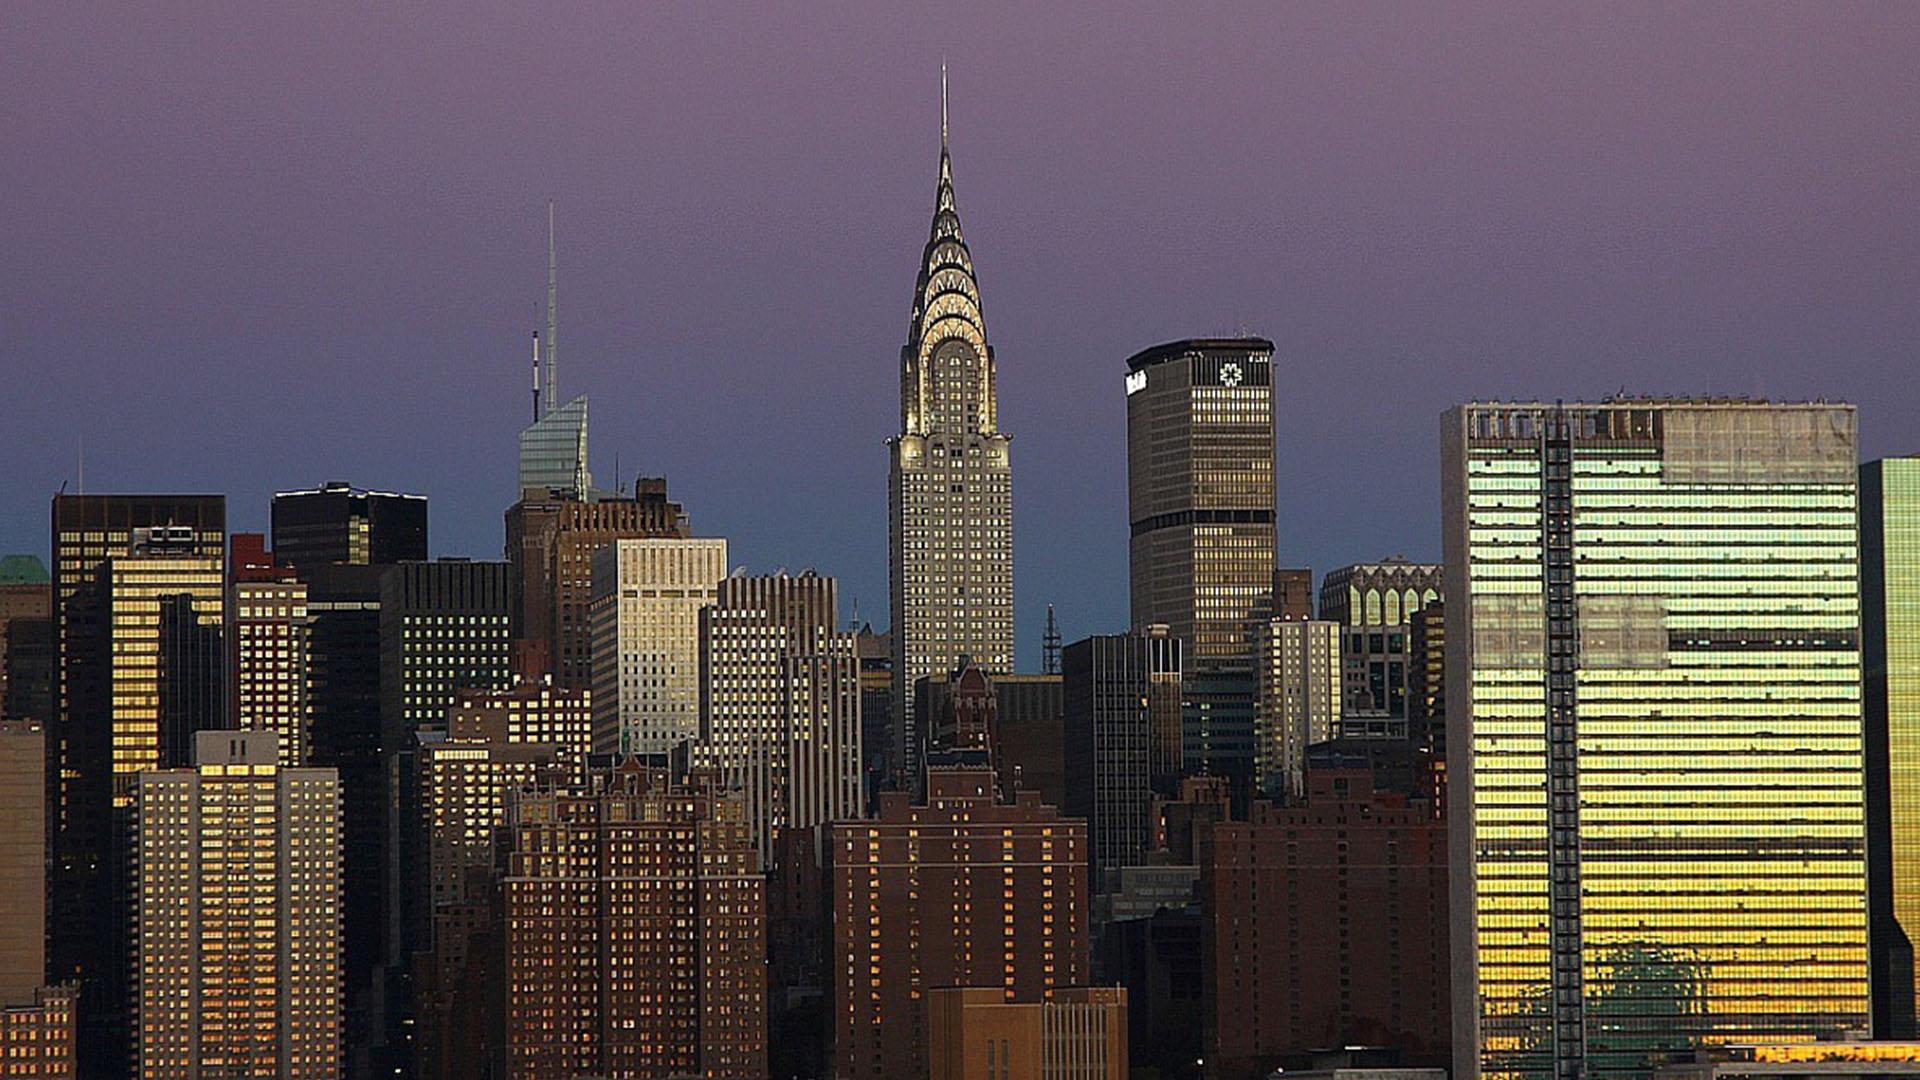 Vista de Chrysler Building